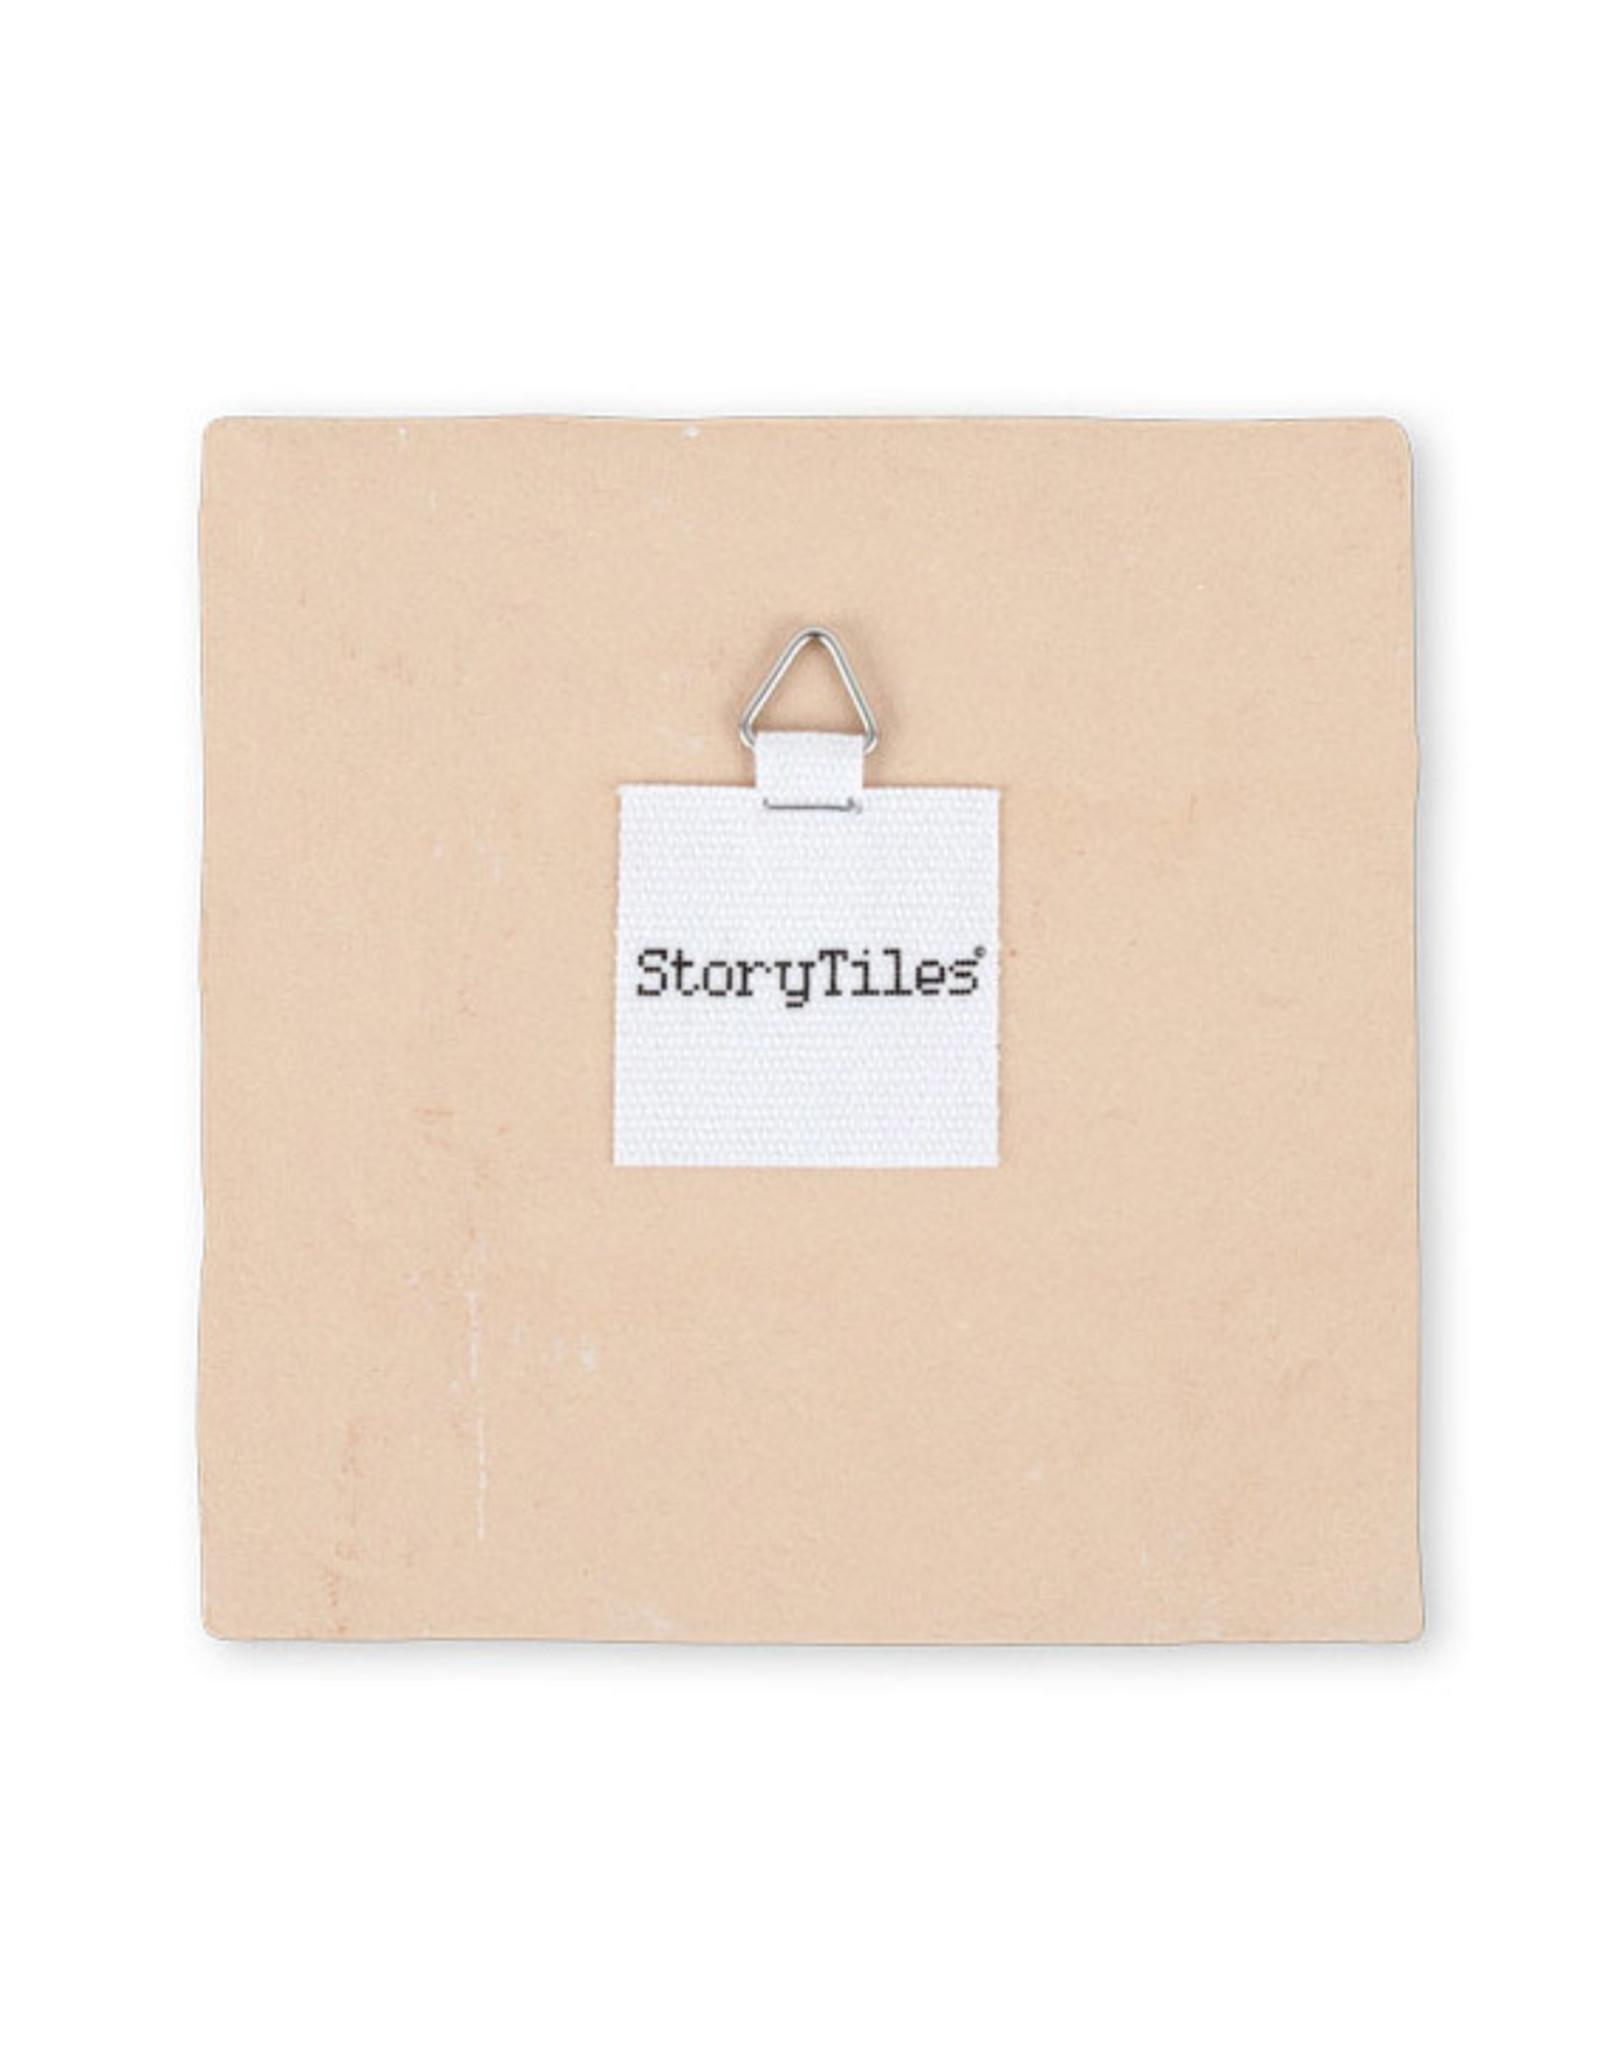 "StoryTiles ""bananas"" Tile"